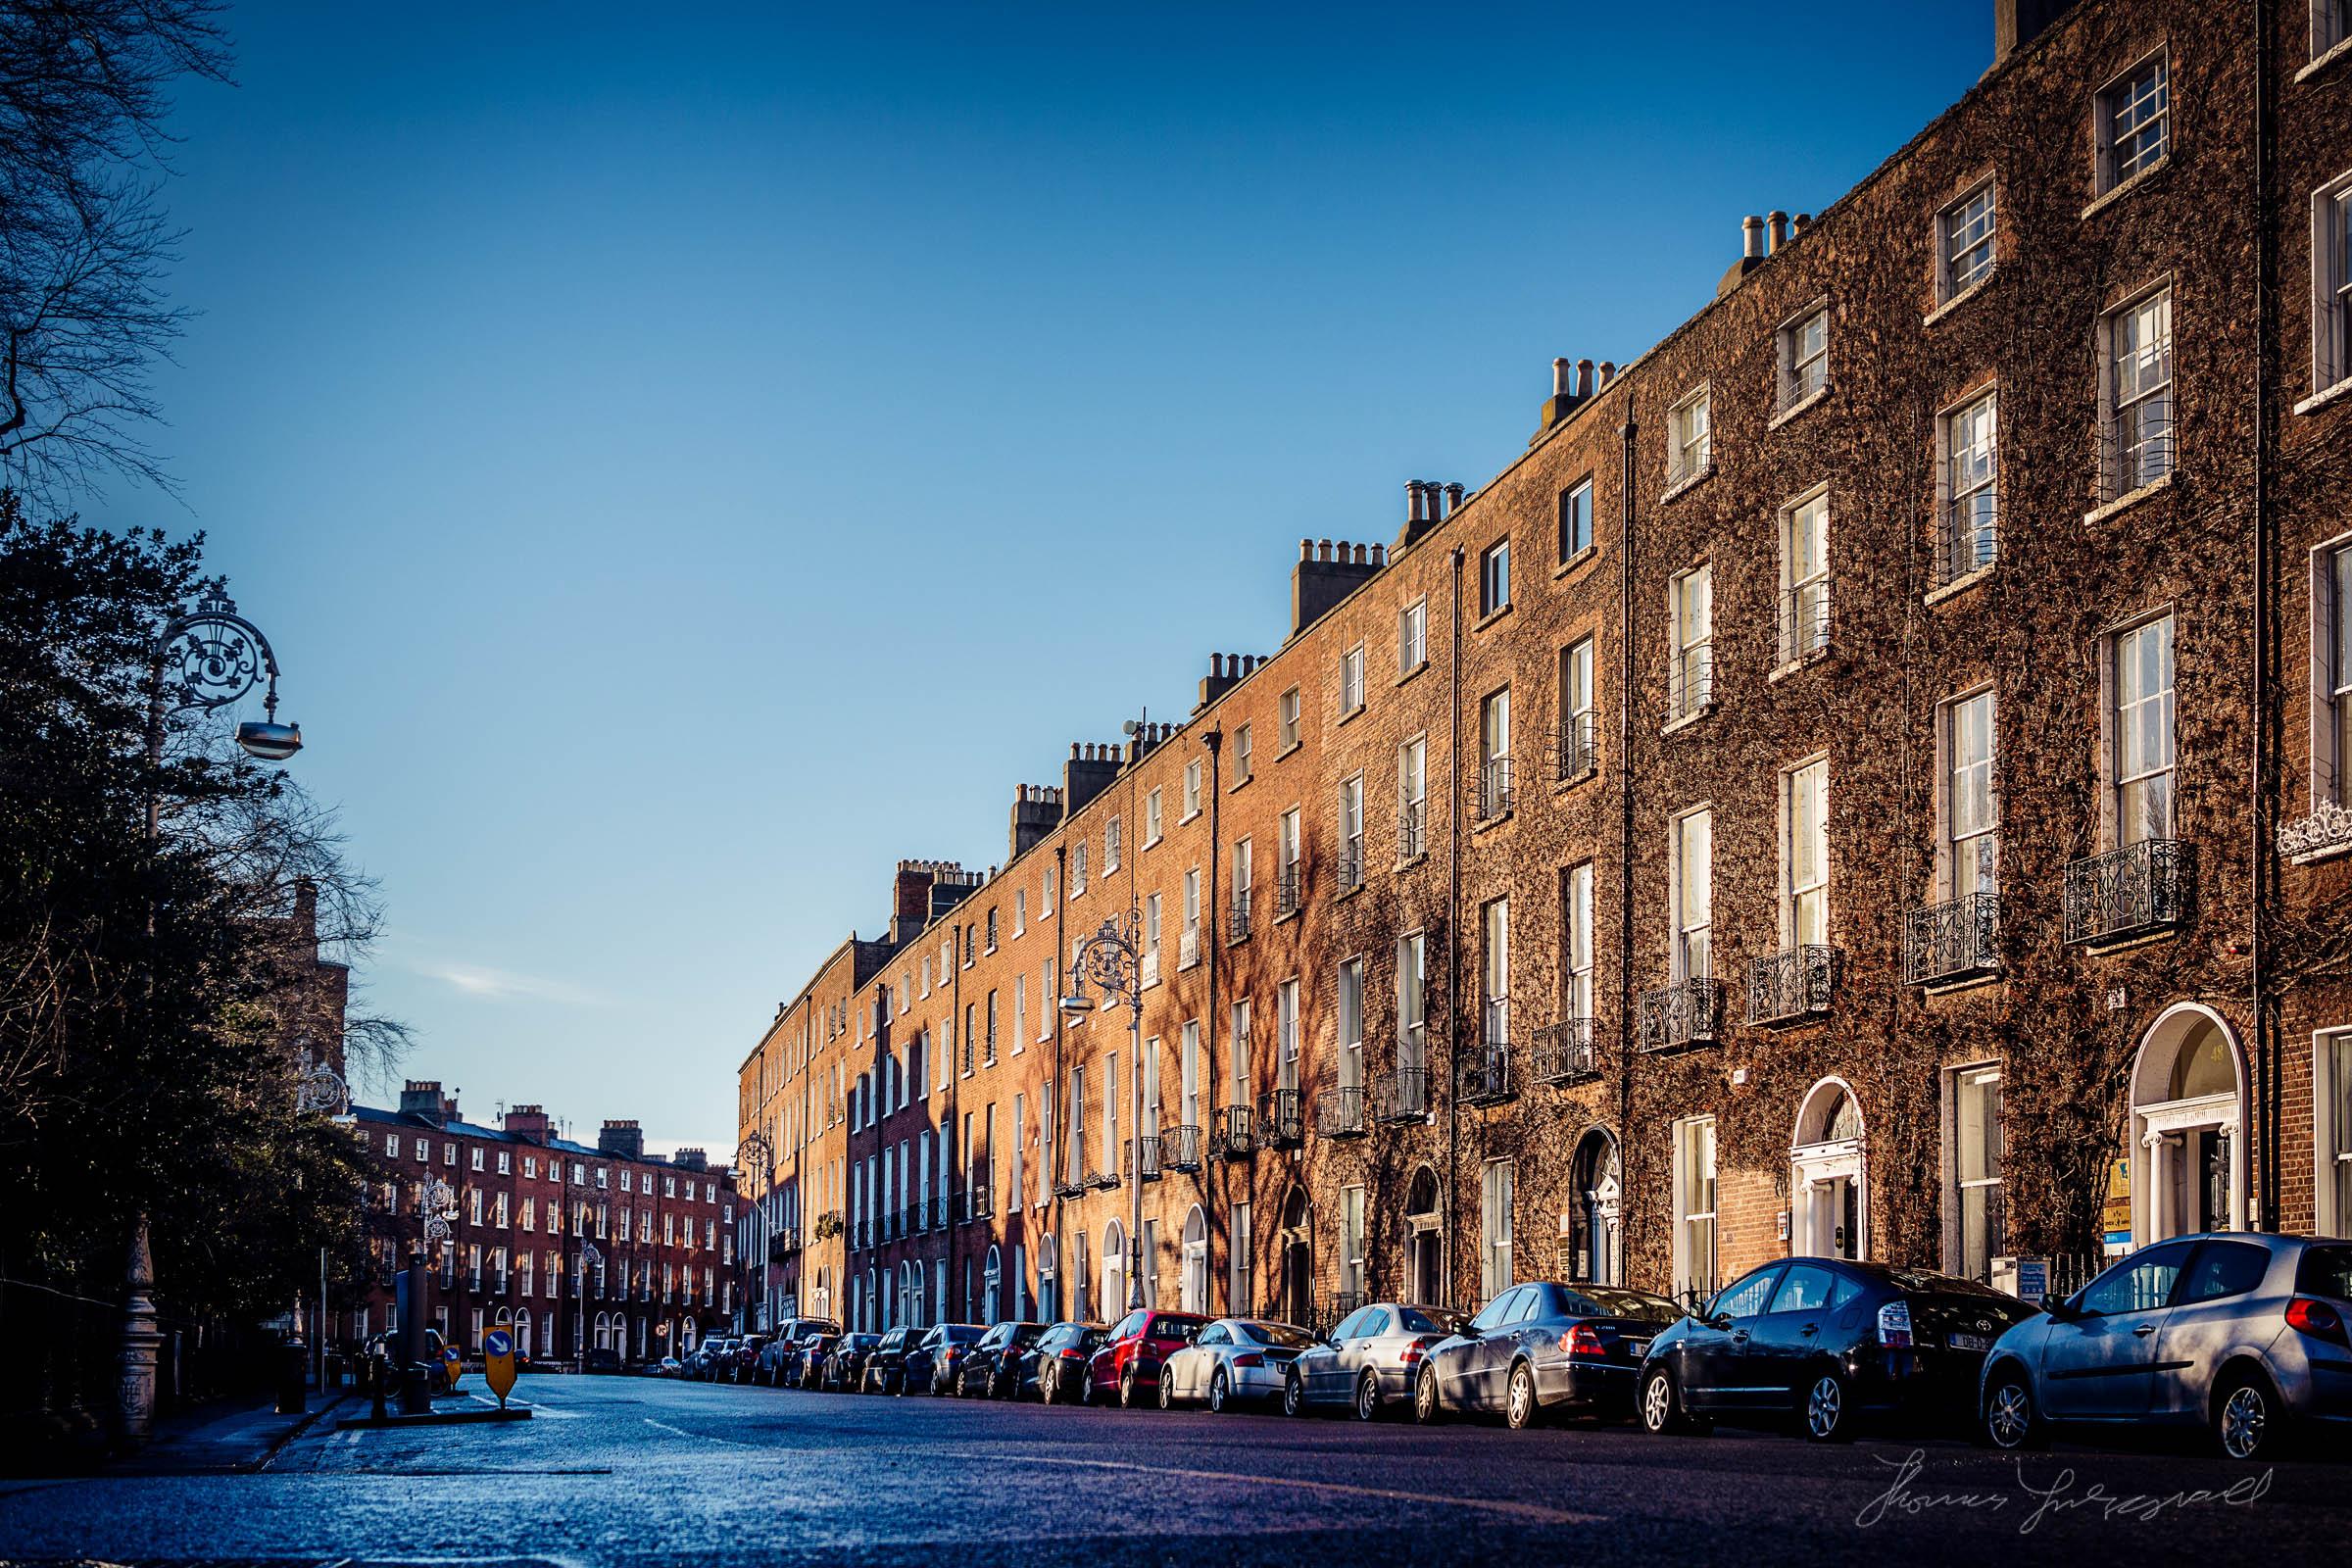 A winter scene in Dublin